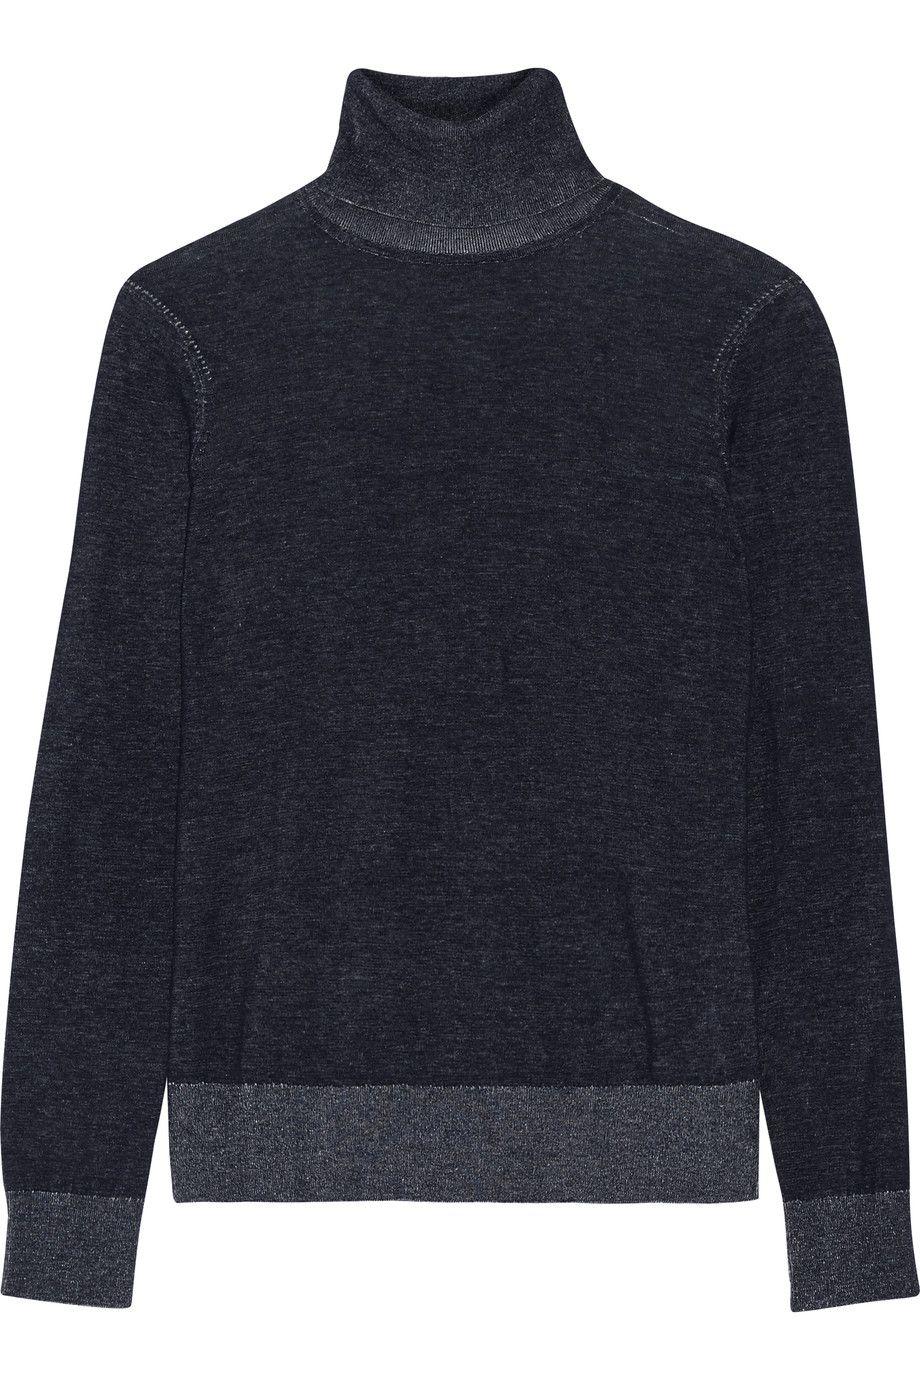 Men Long Sleeve Thermal Cotton High Collar Skivvy Turtle Neck Sweater Winter UK